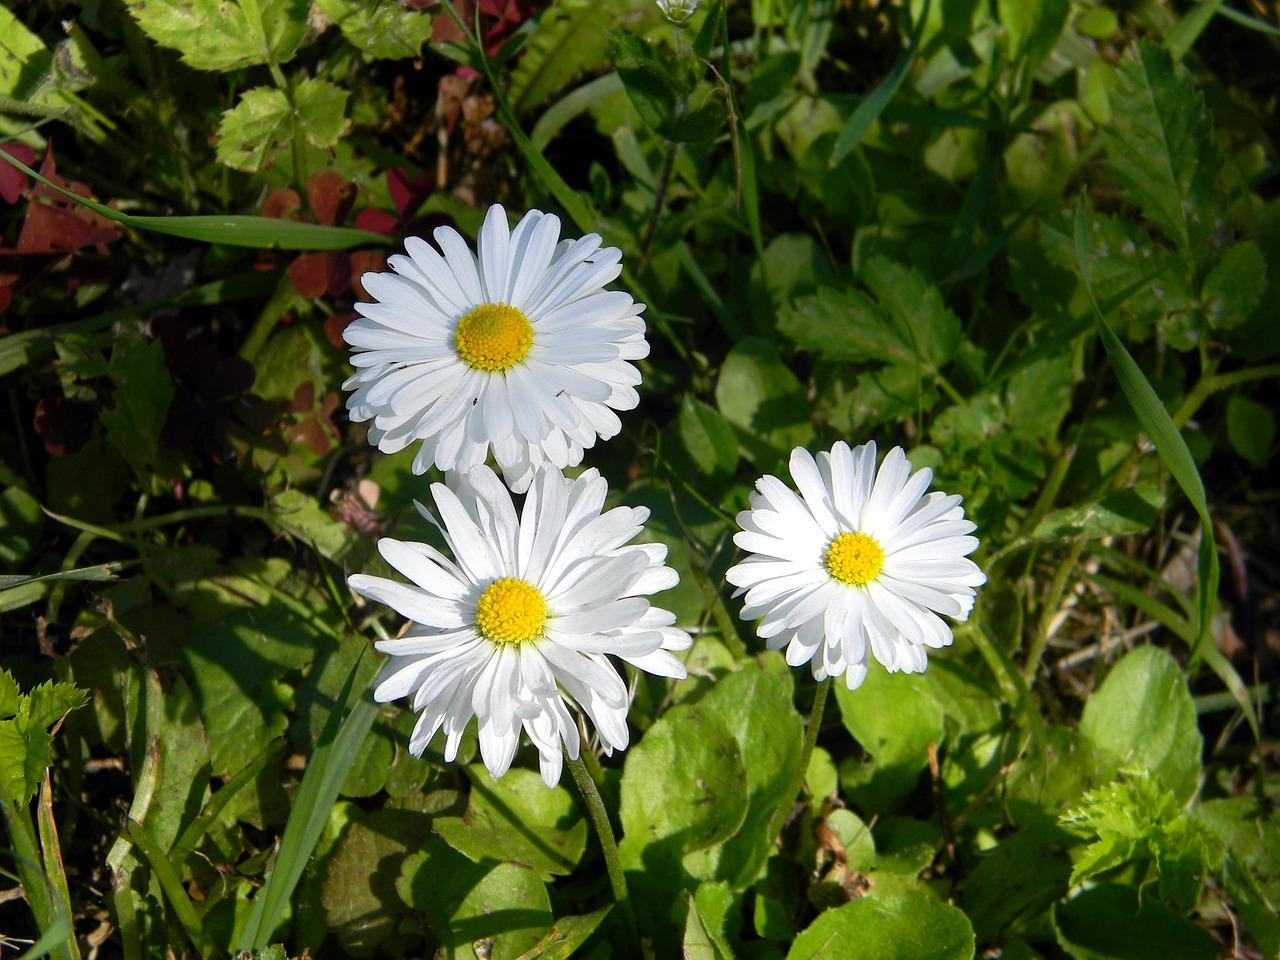 Daisyflowerwhite Flowersfieldchamomile Free Photo From Needpix